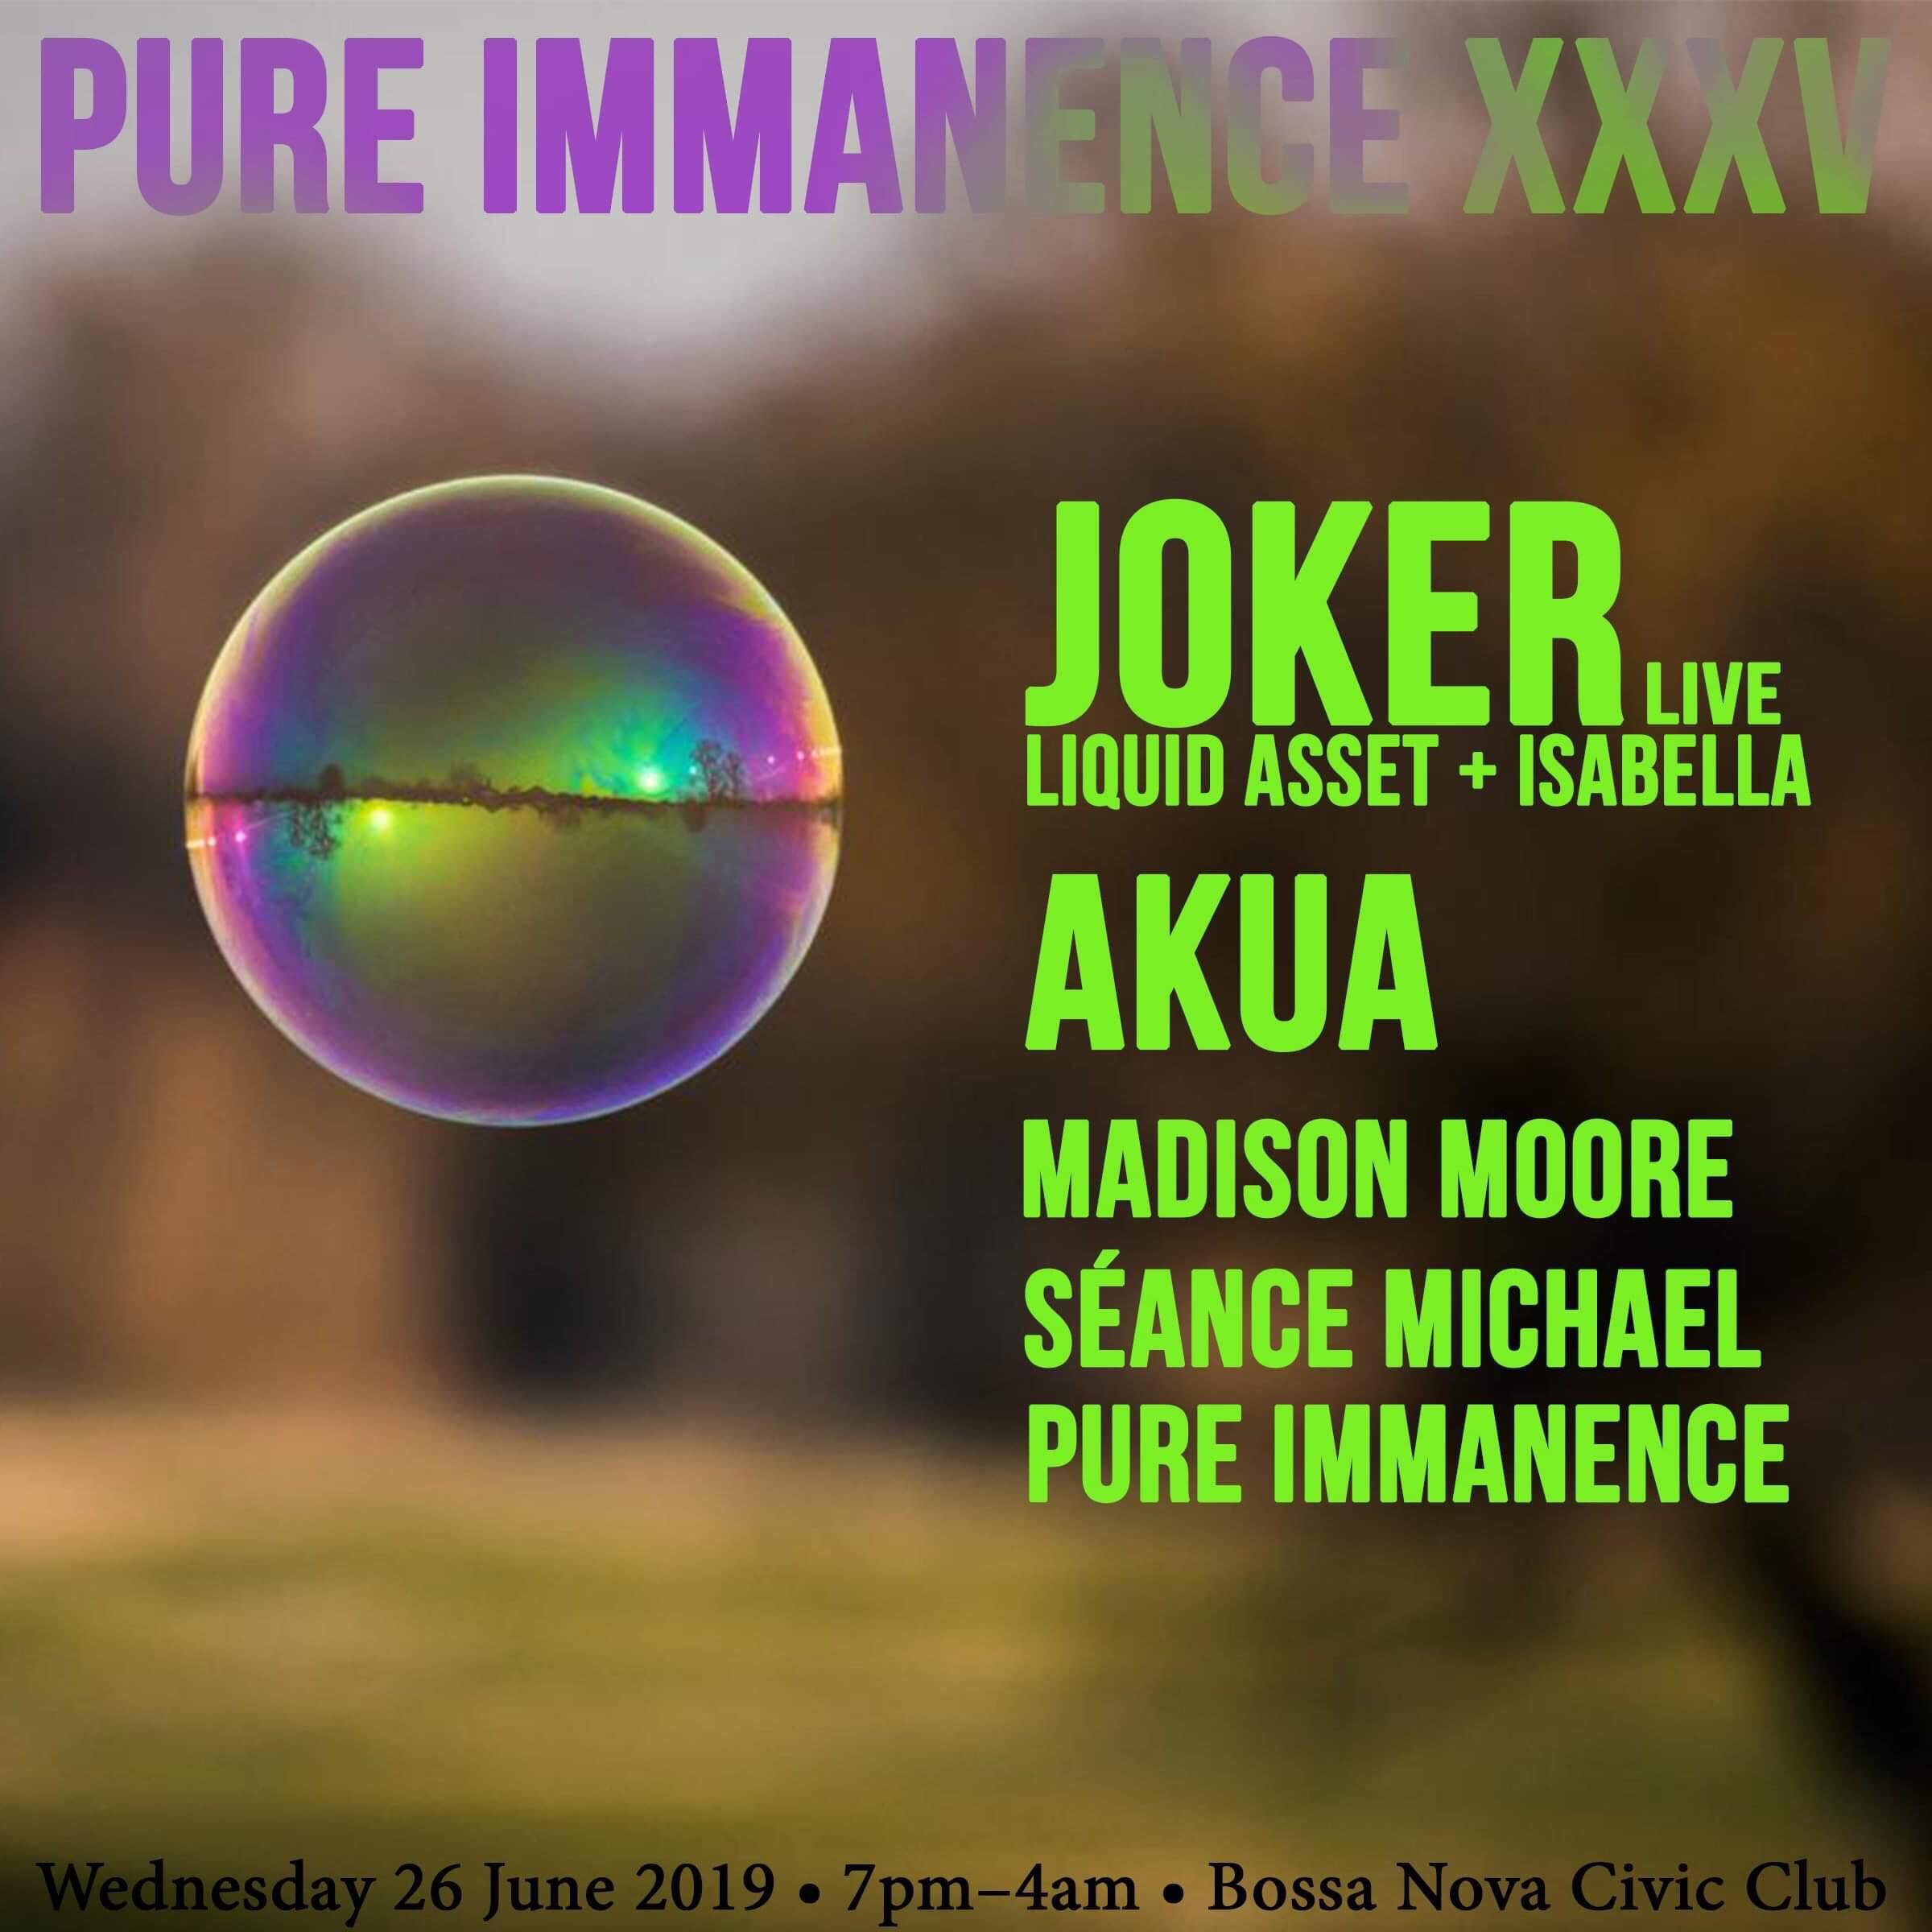 Pure Immanence XXXV.jpg